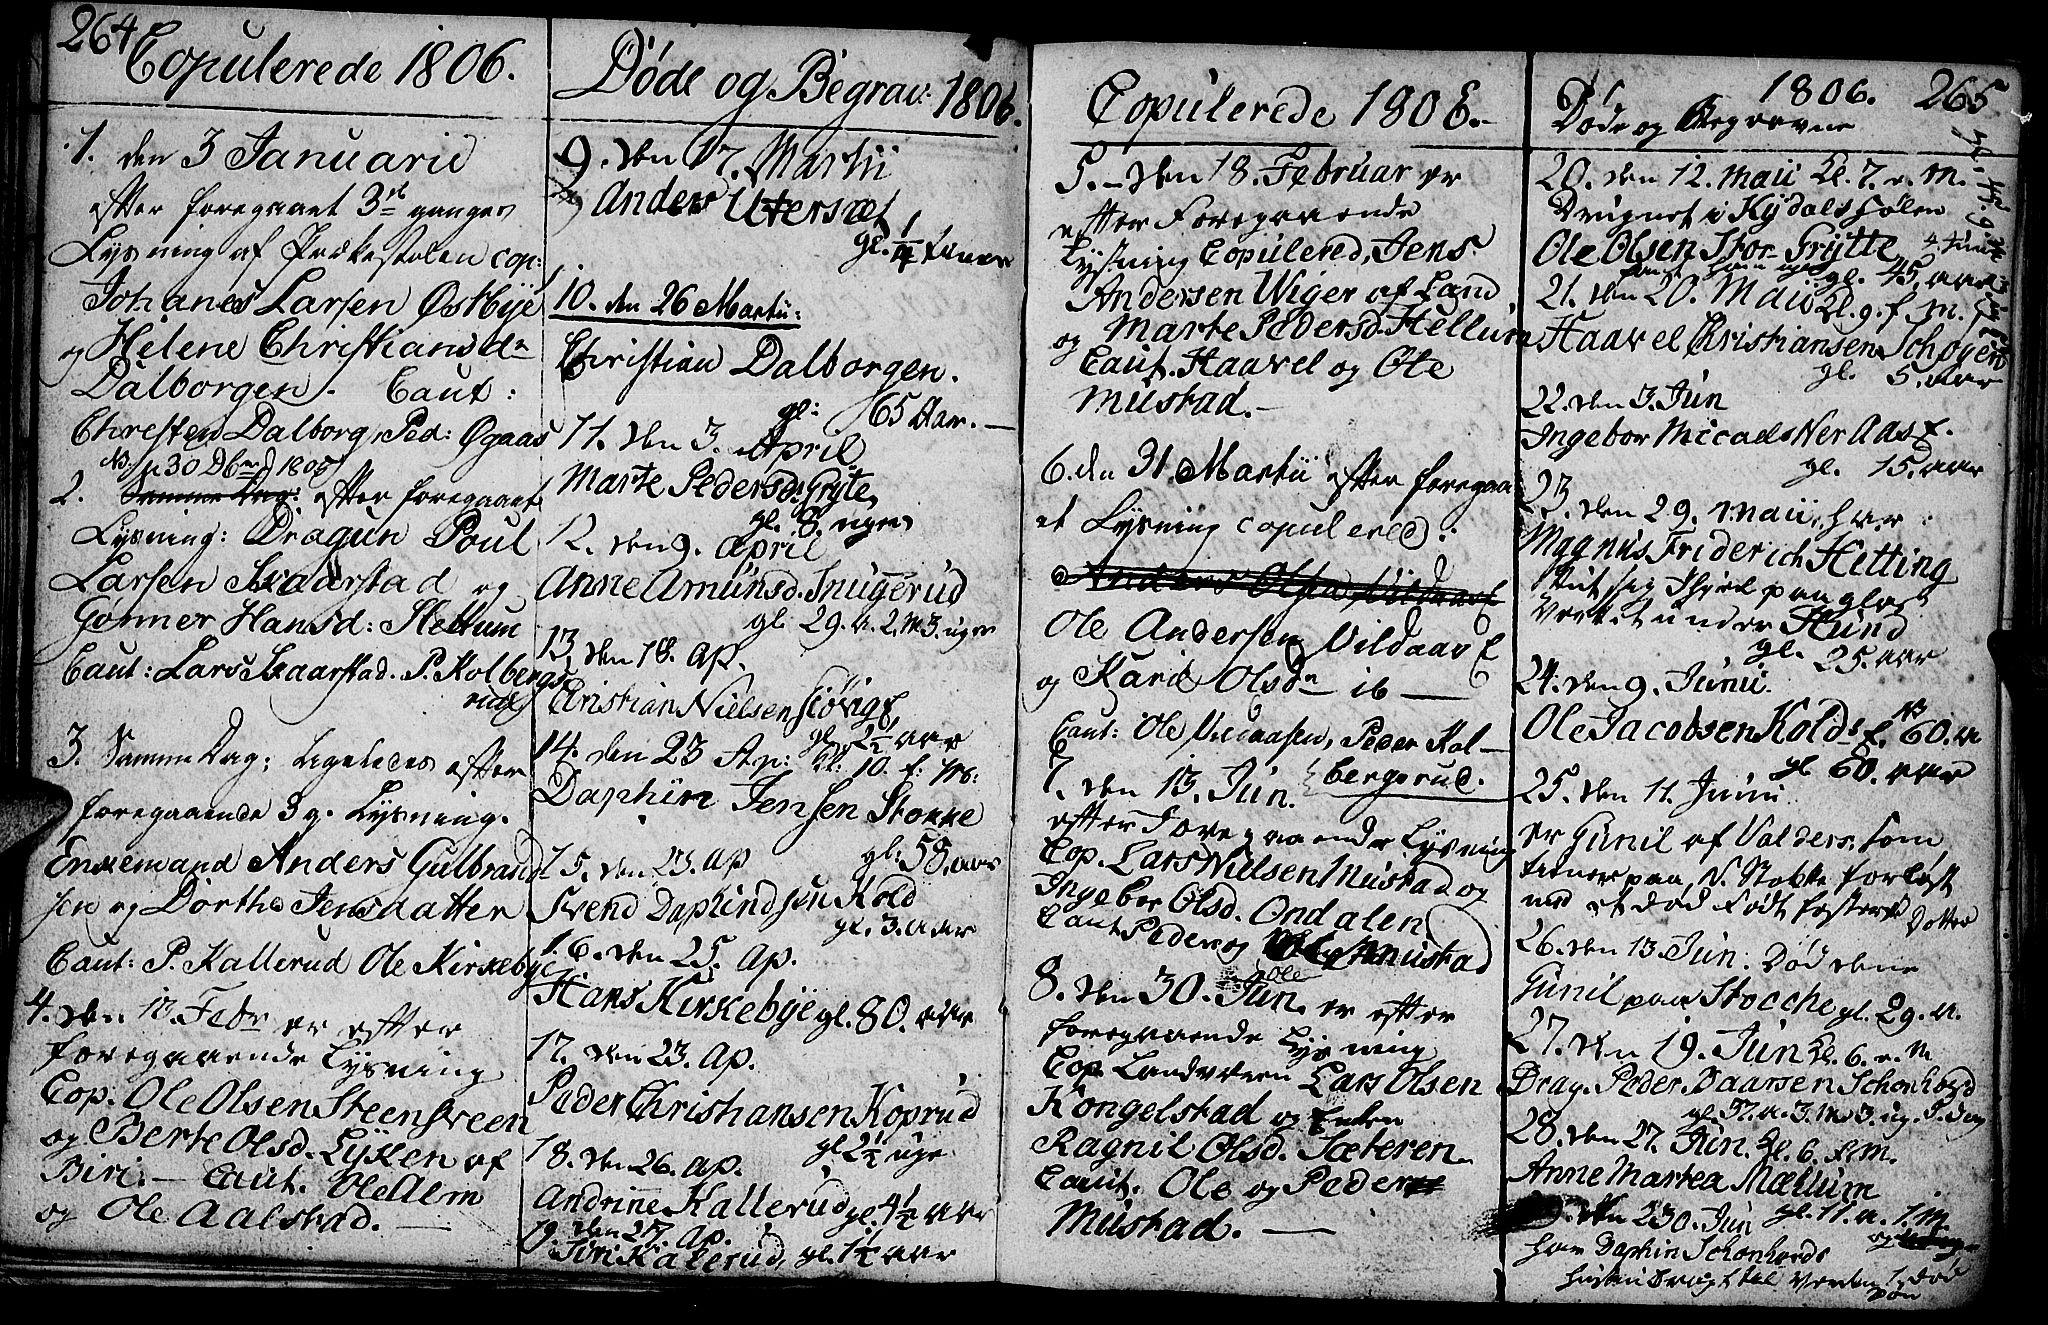 SAH, Vardal prestekontor, H/Ha/Hab/L0003: Klokkerbok nr. 3, 1803-1808, s. 264-265